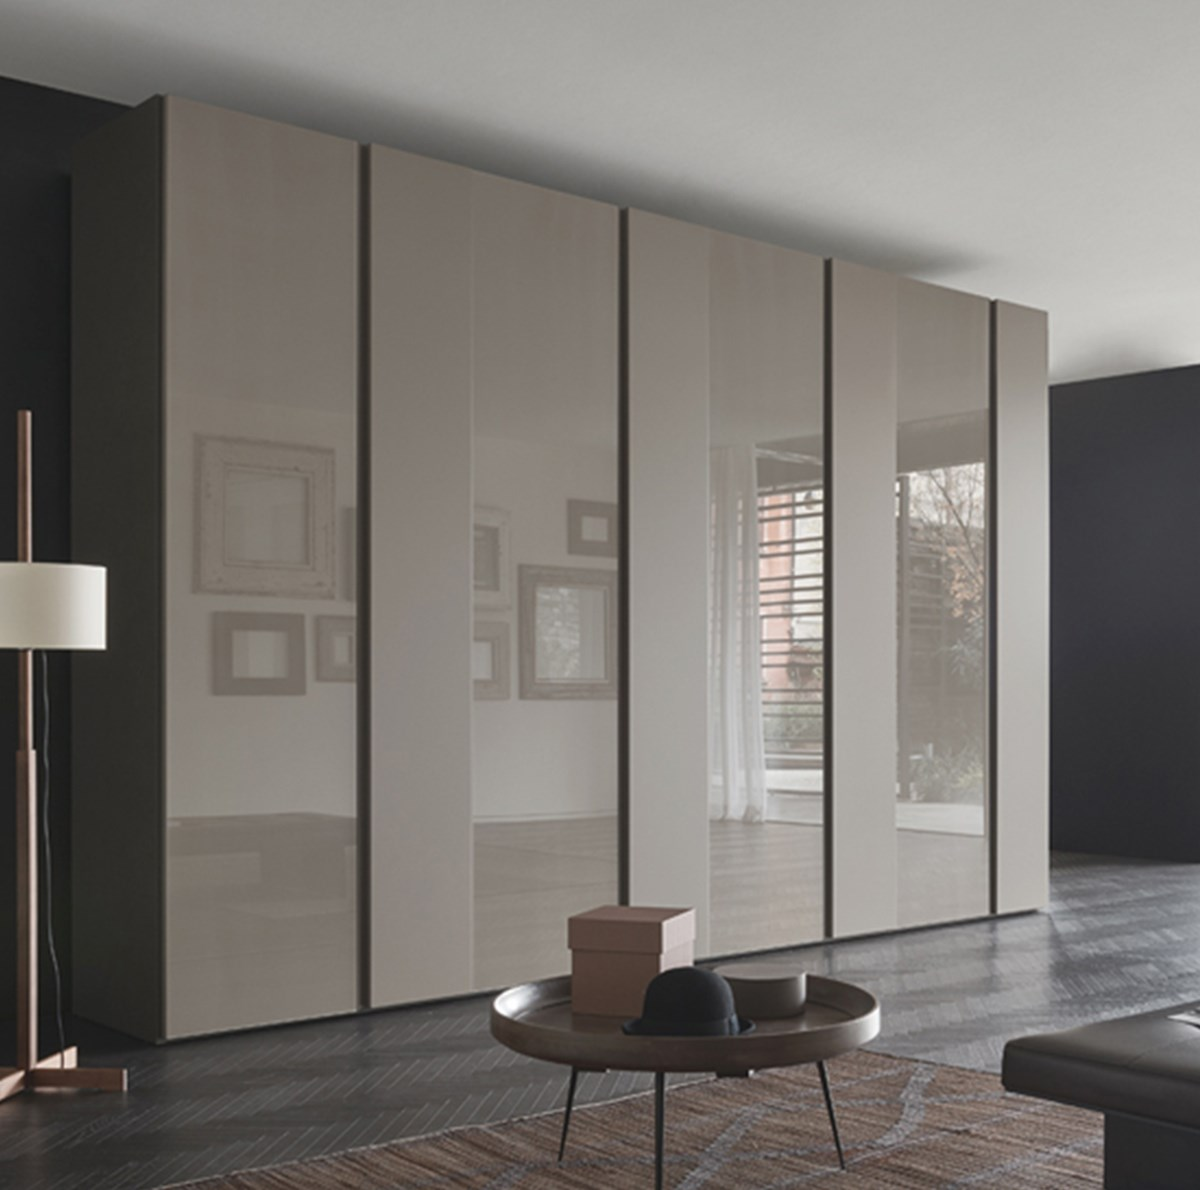 Sangiacomo-Breccia-SP35-Wardrobe-Matisse-1